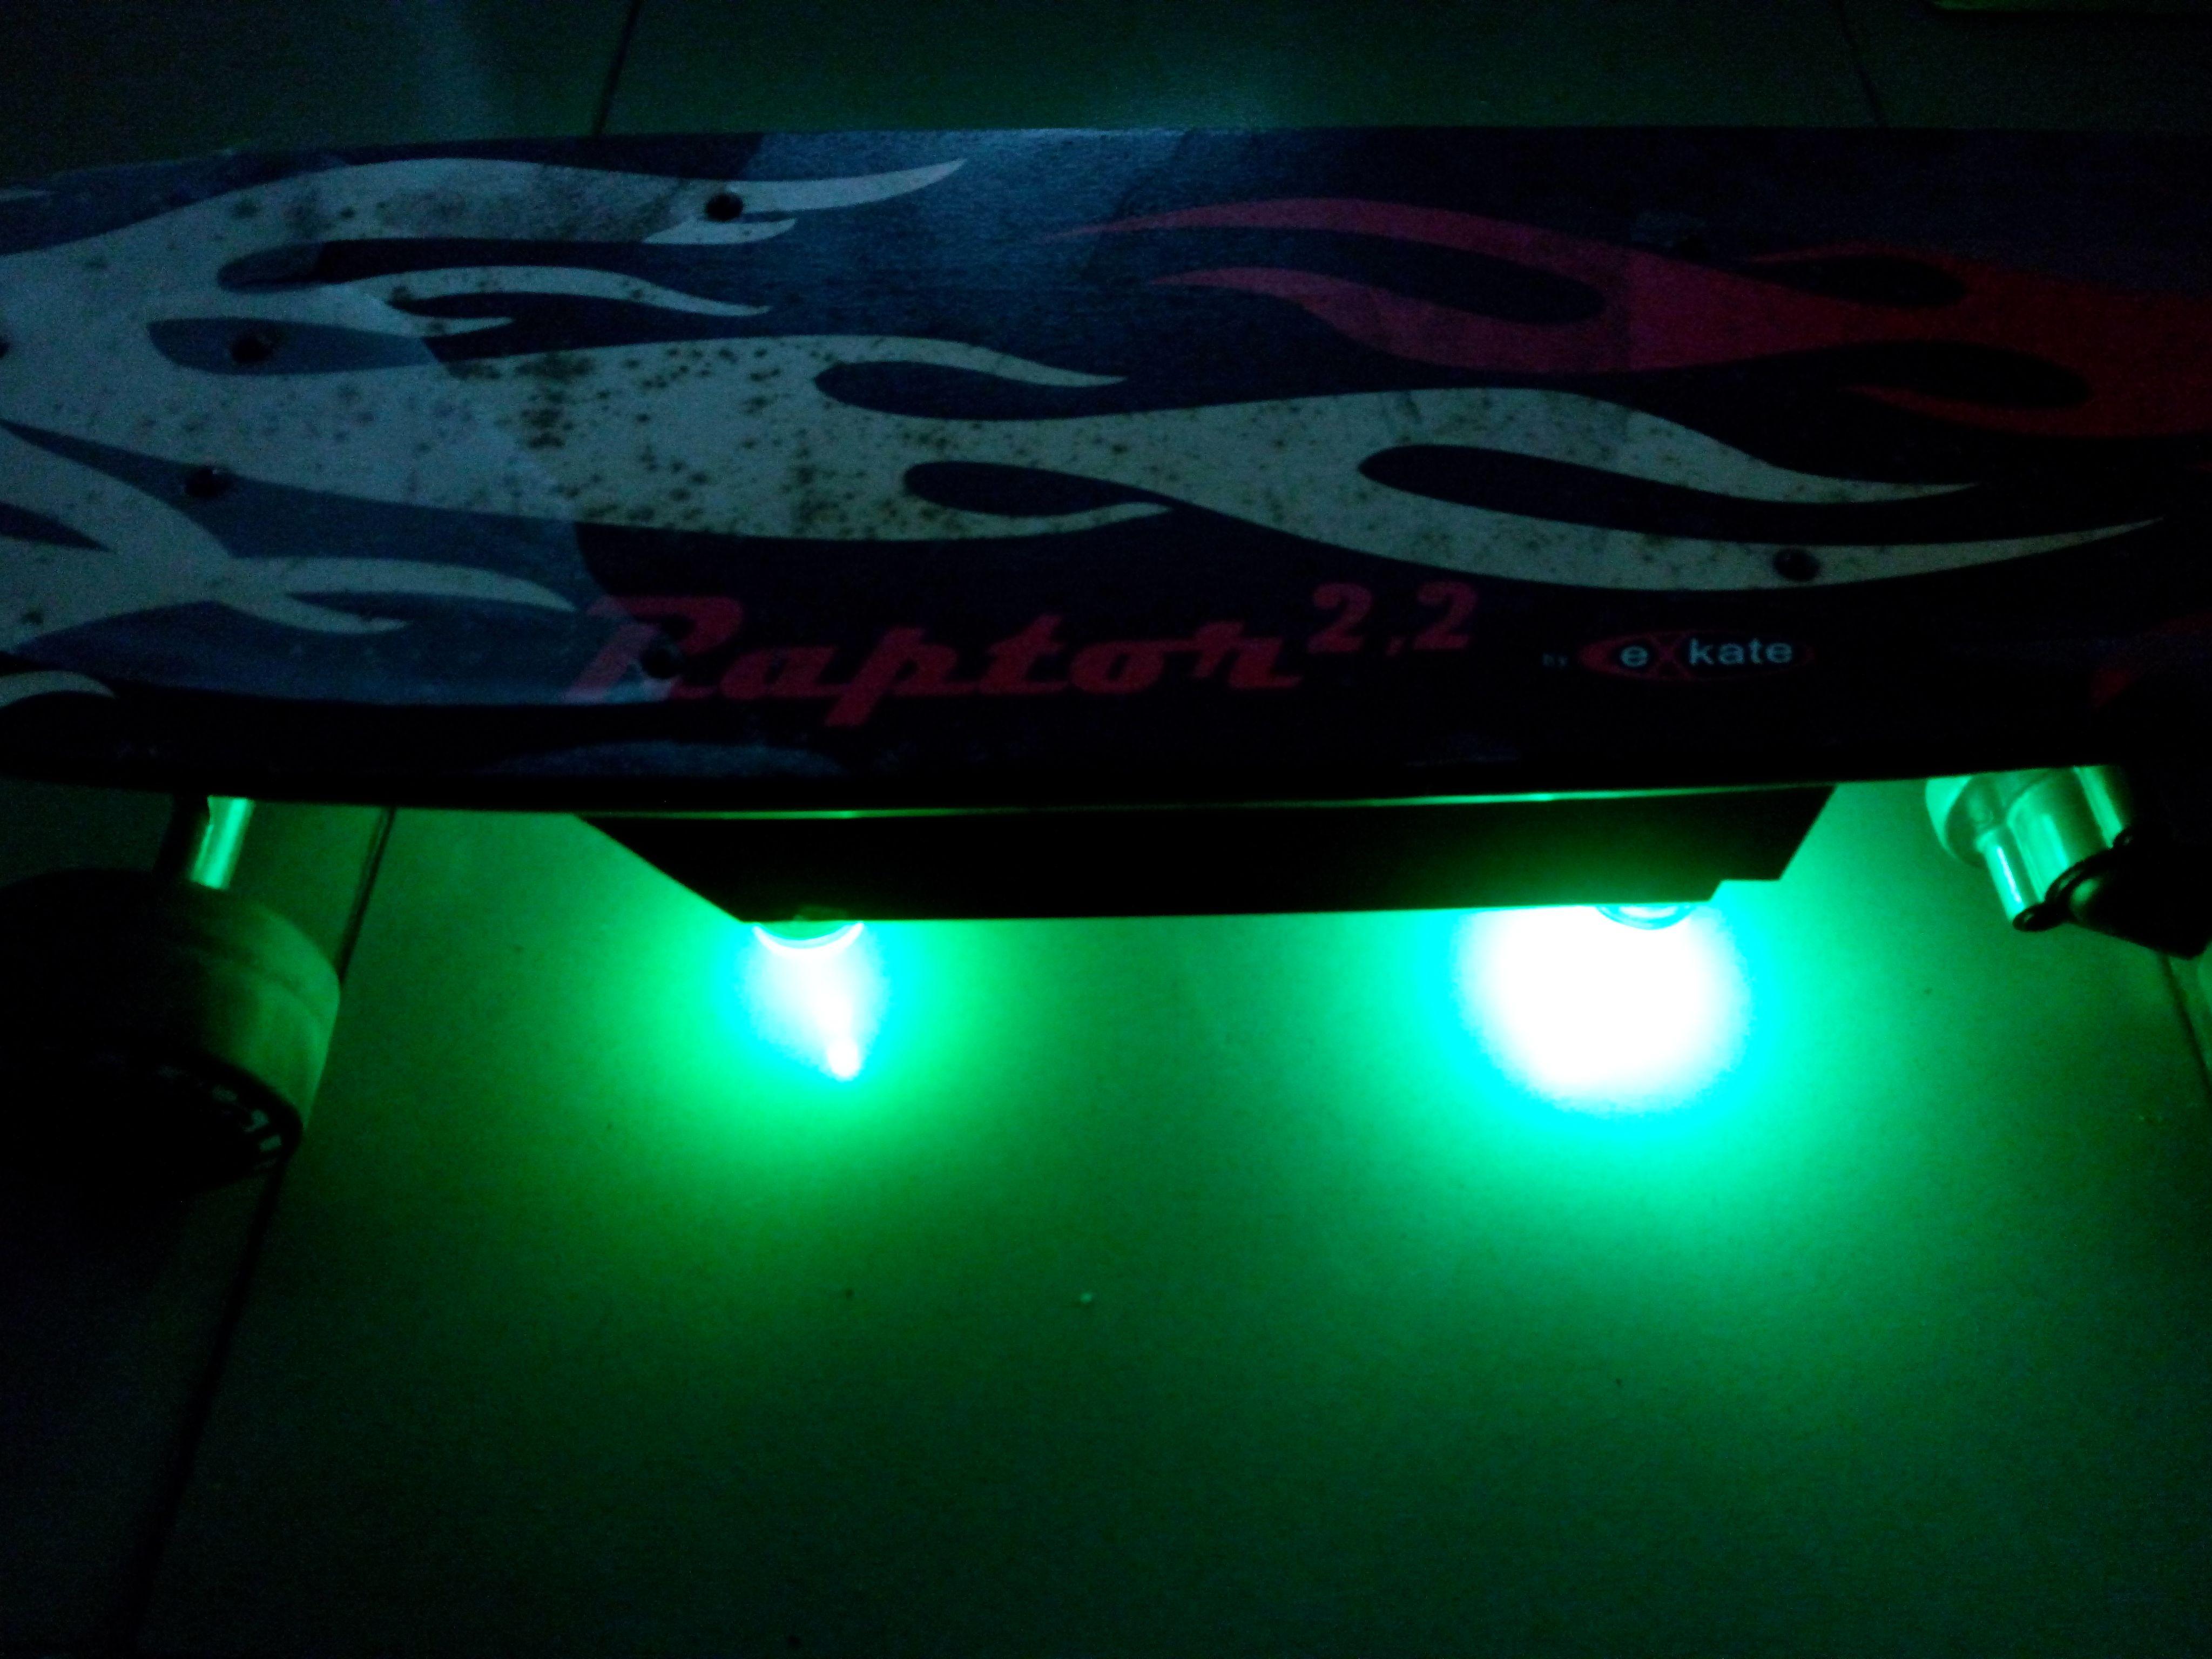 underglow 16 underglow and interior underglow atv led light kit